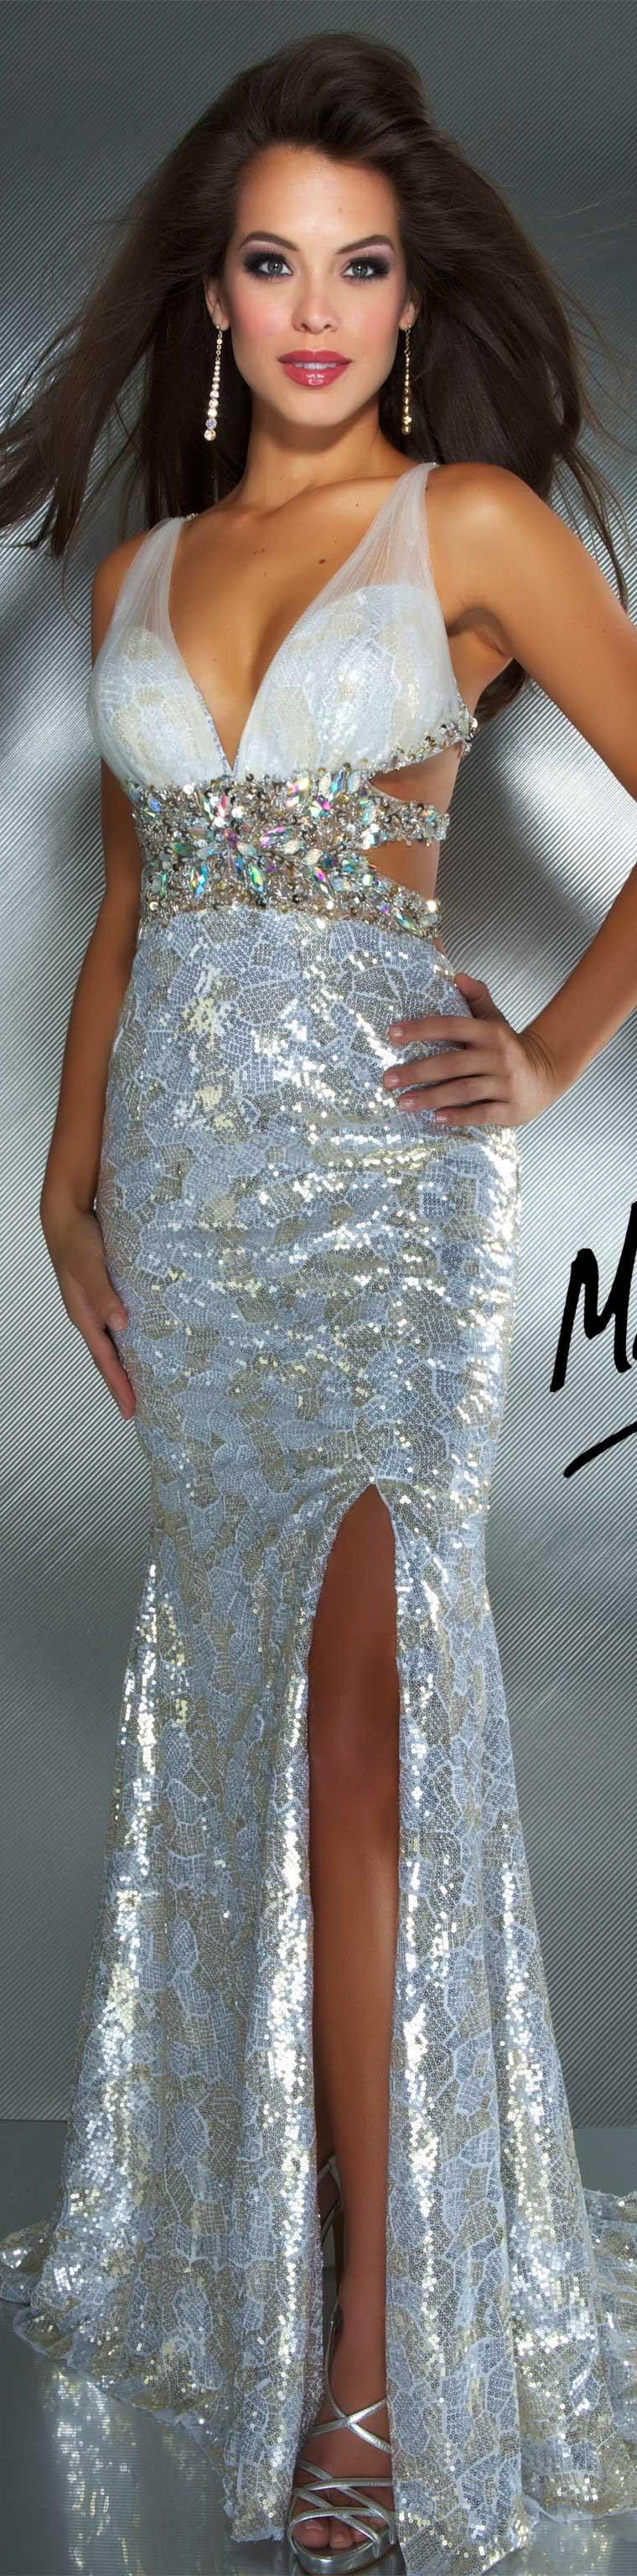 Mac duggal couture dress ivory gold long dress glitter mac